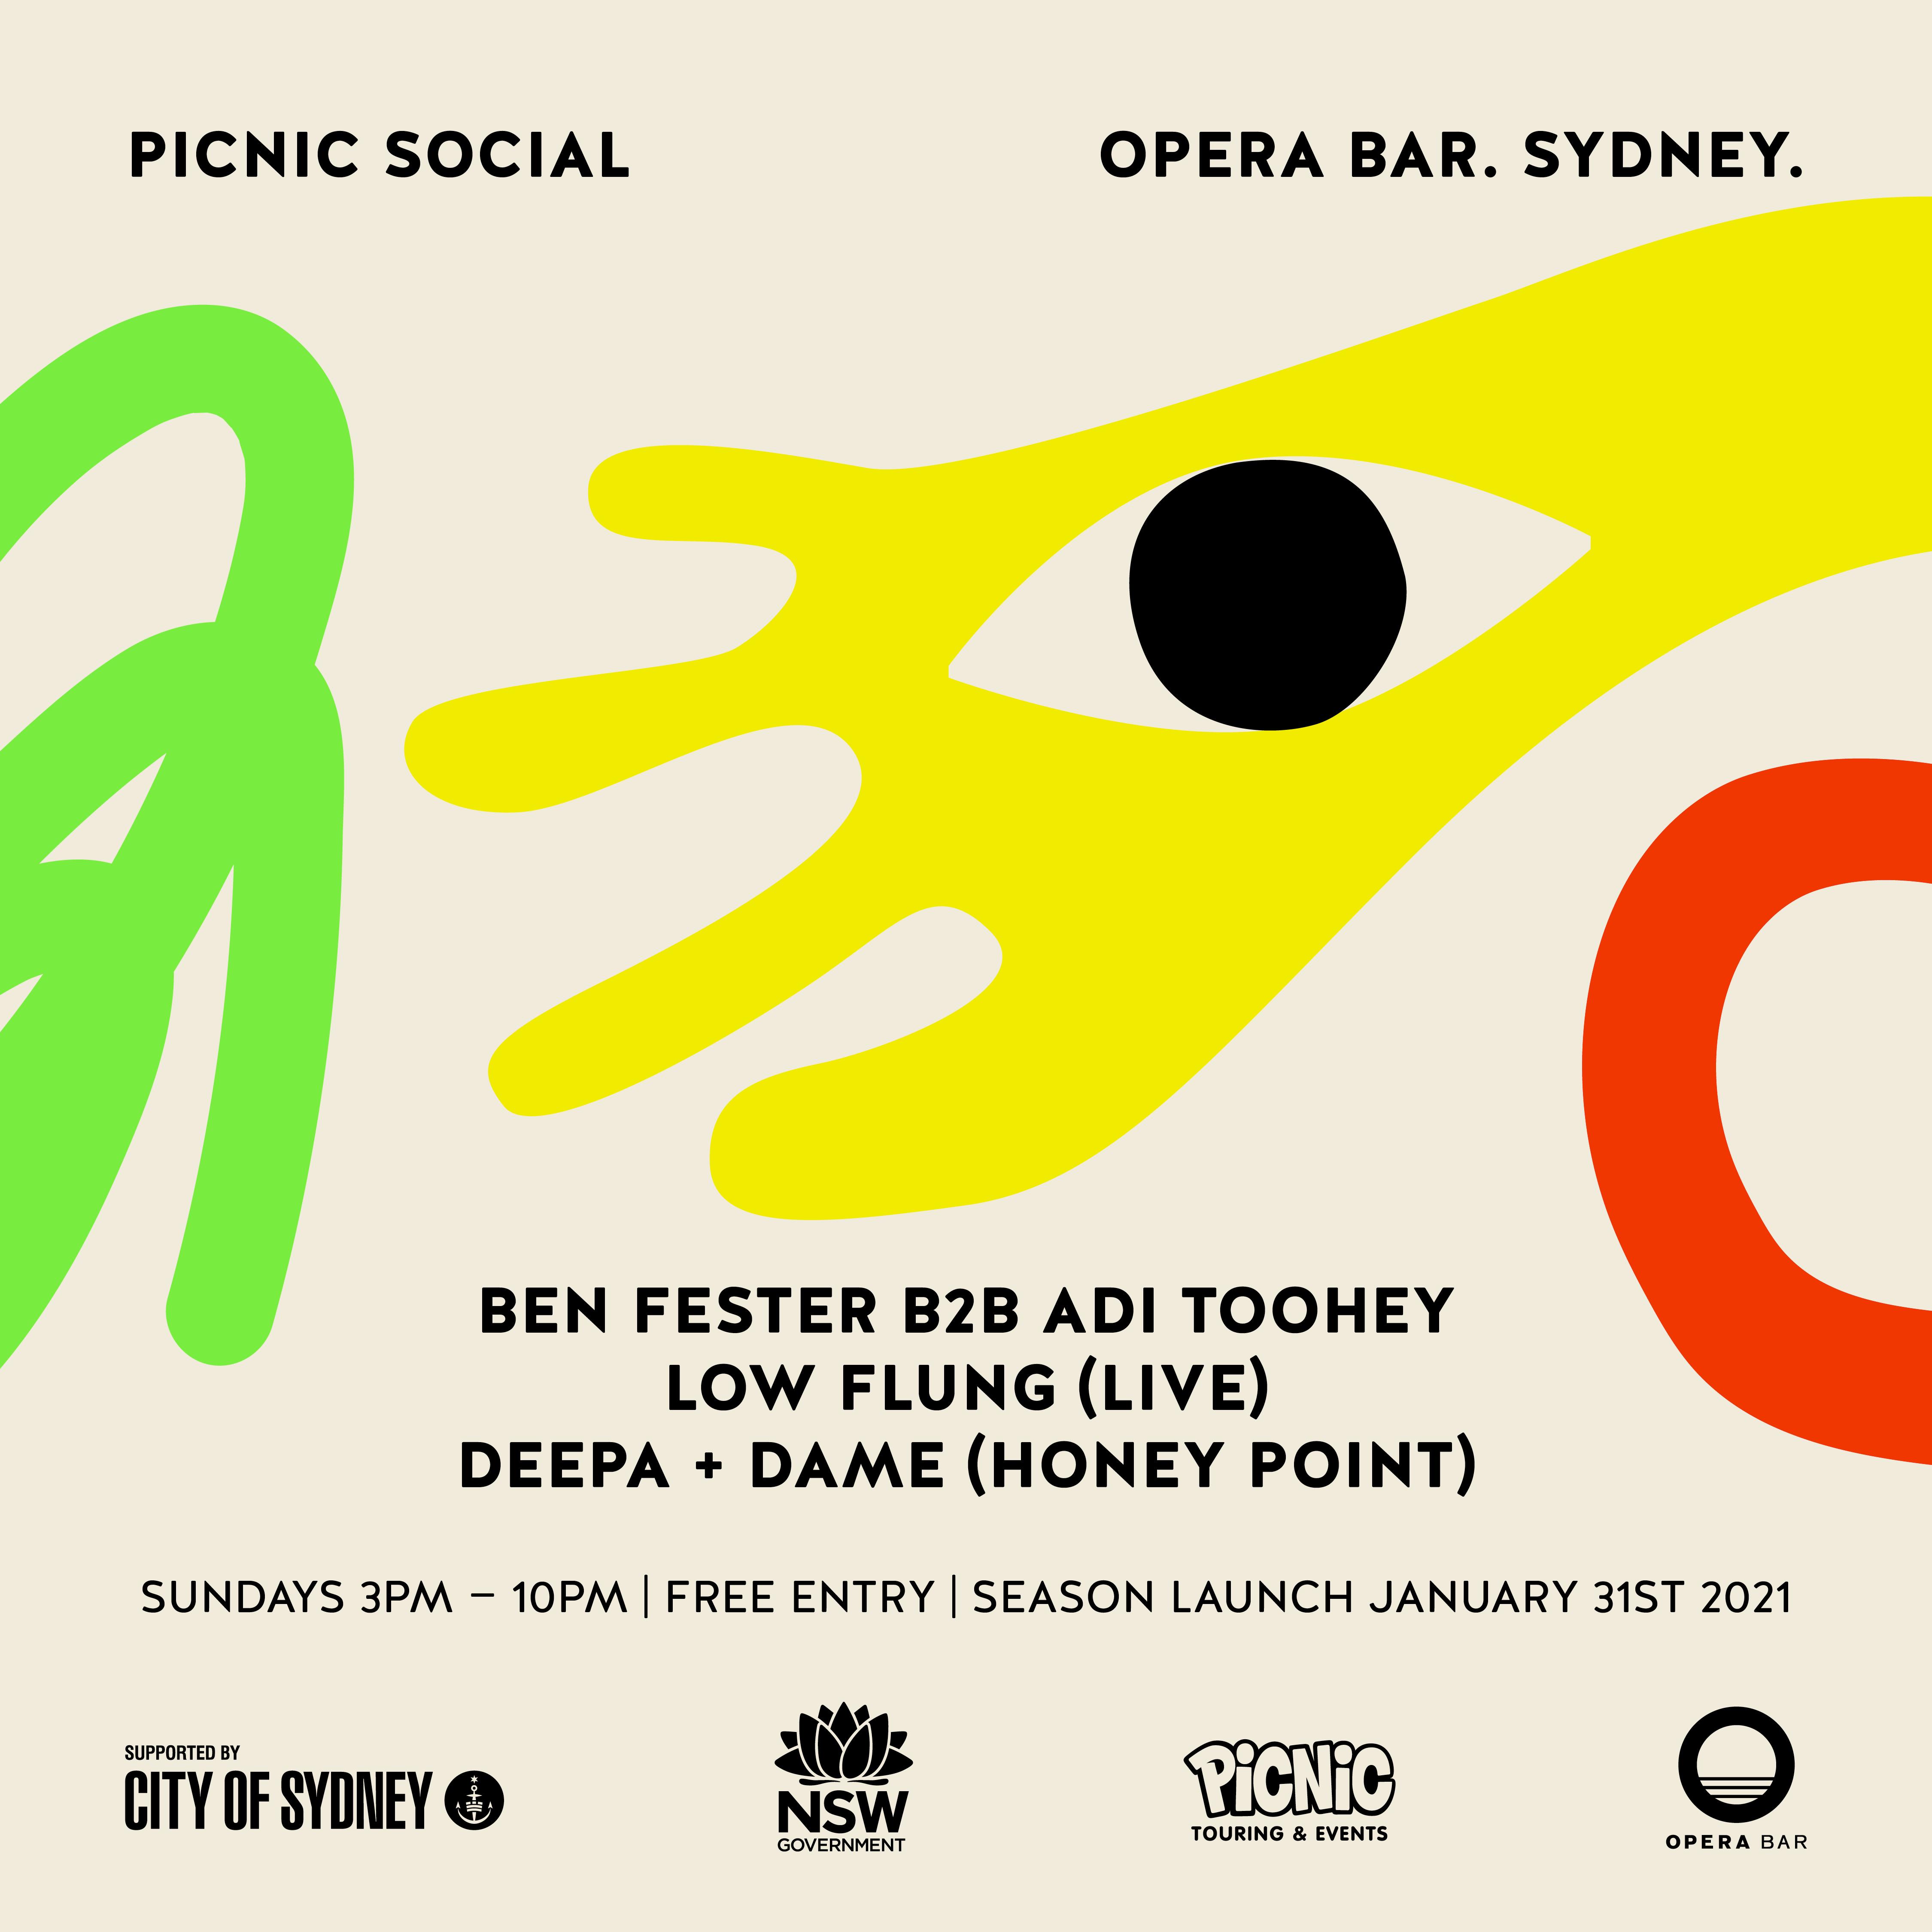 Picnic Social @ Opera Bar Launch